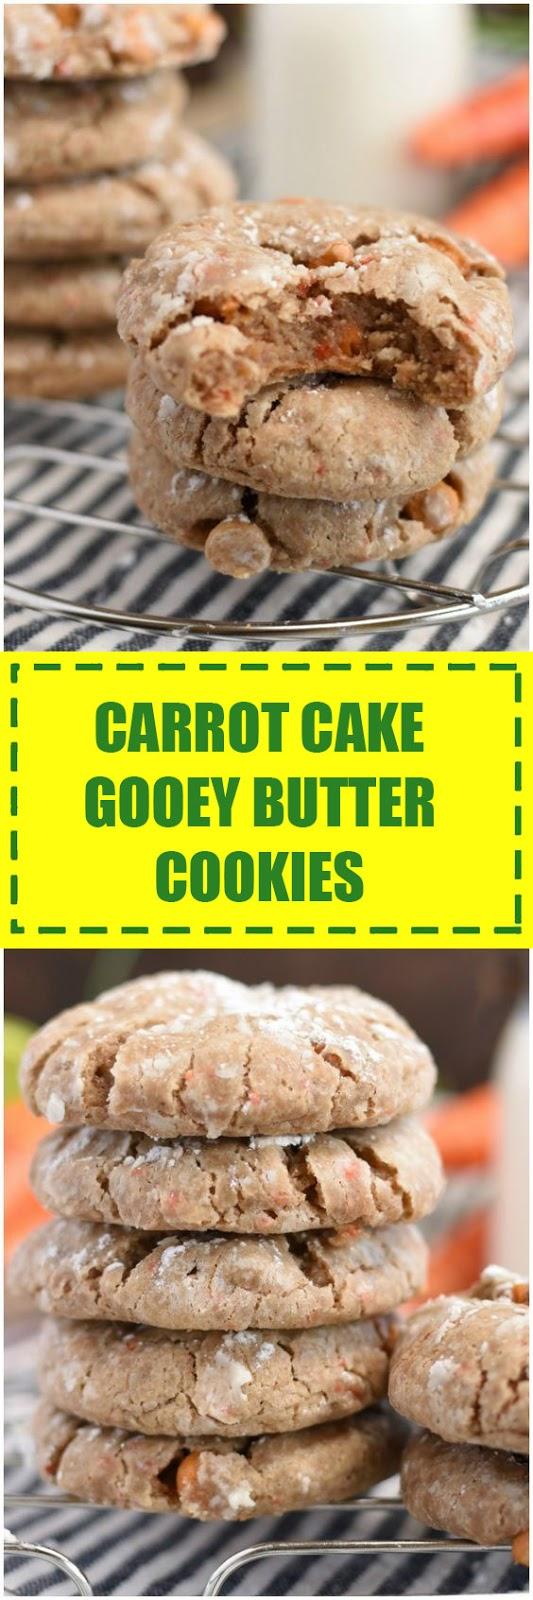 Carrot Cake Gooey Butter Cookies